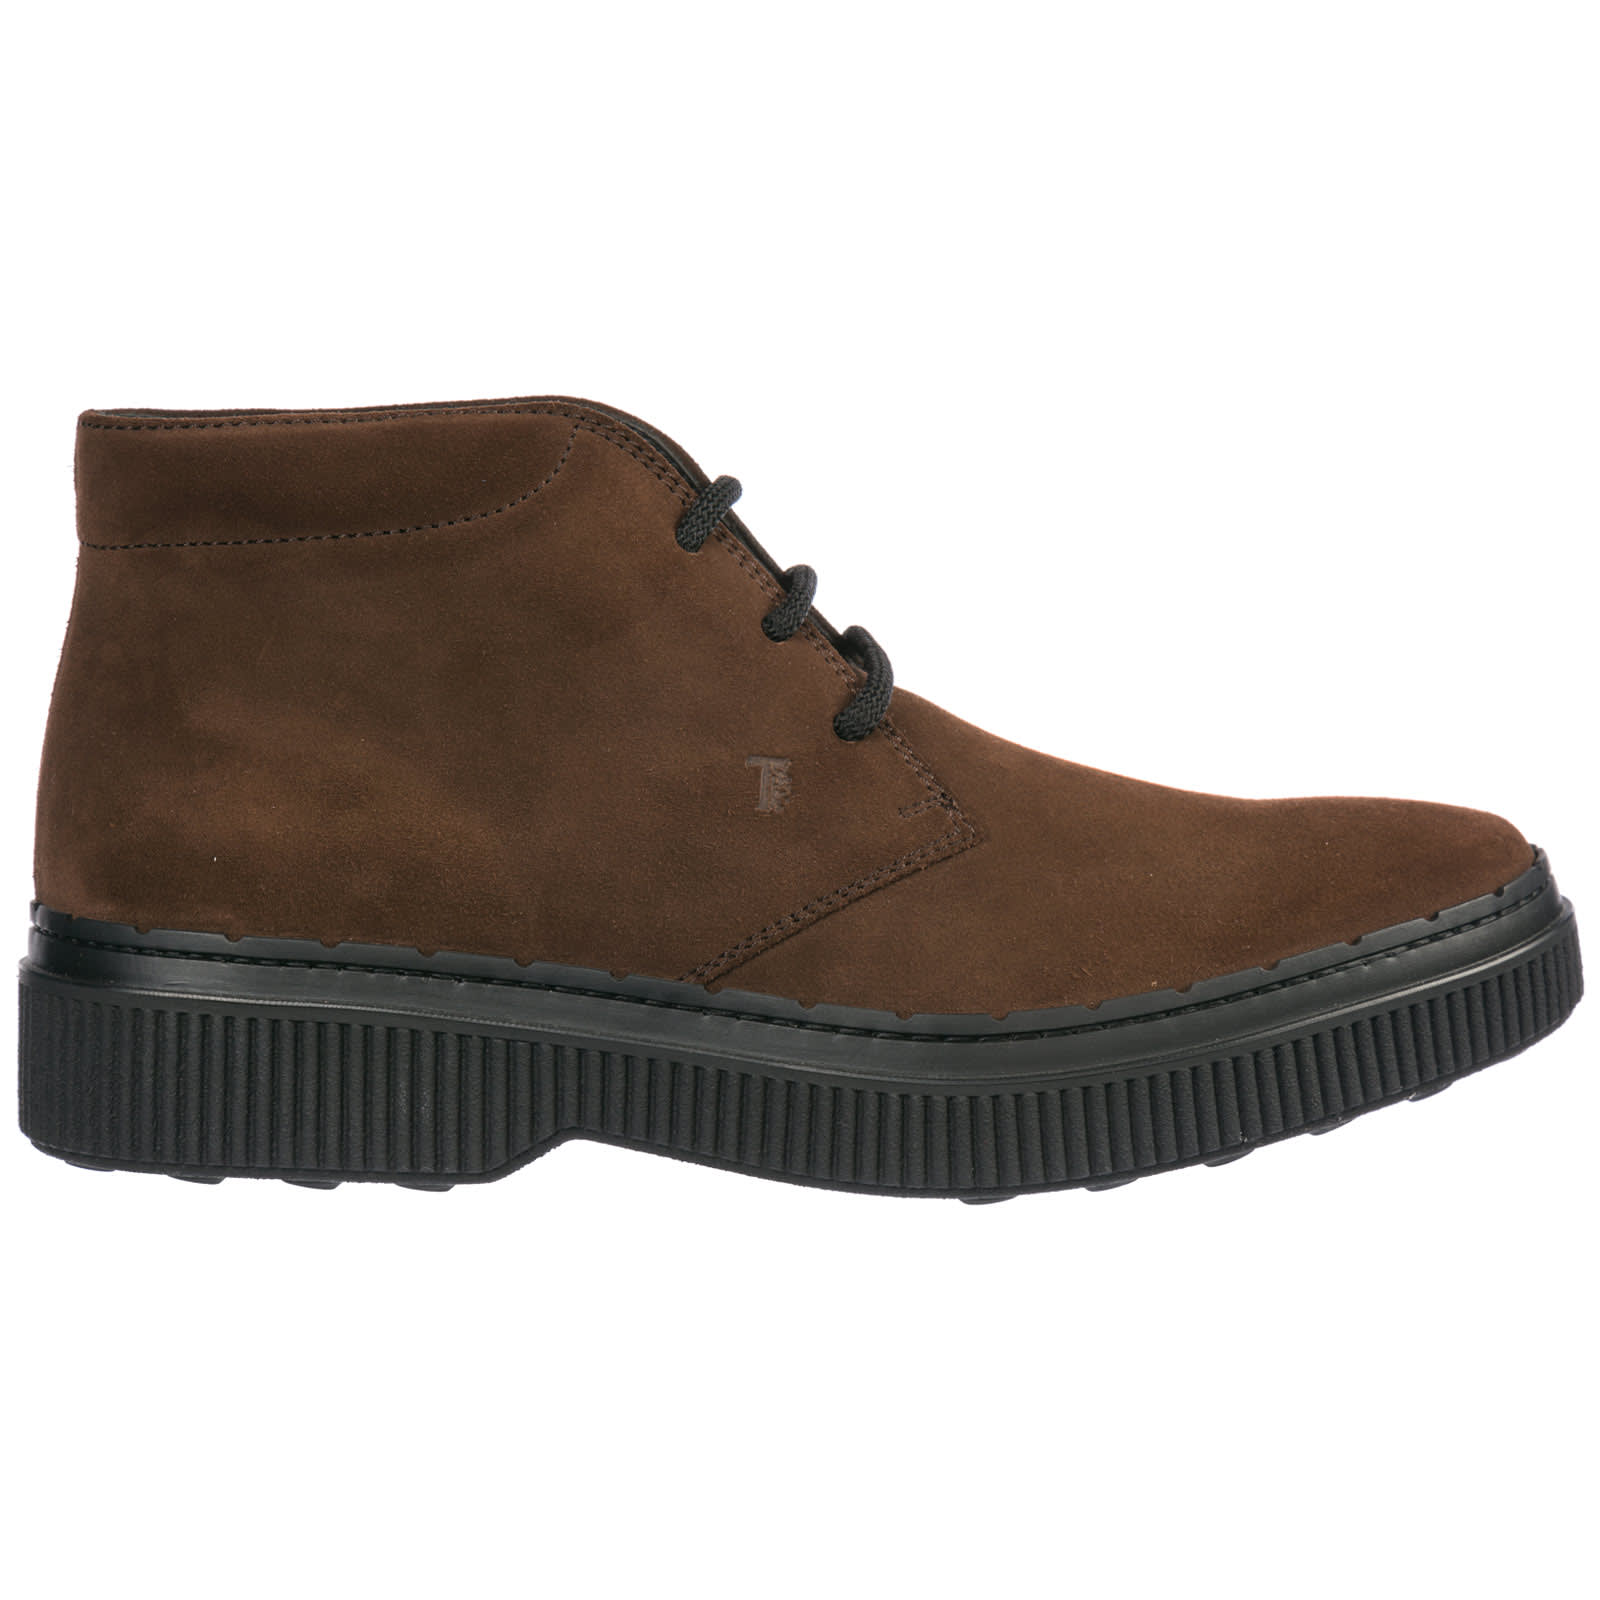 Tods Tropez Vintage Desert Boots